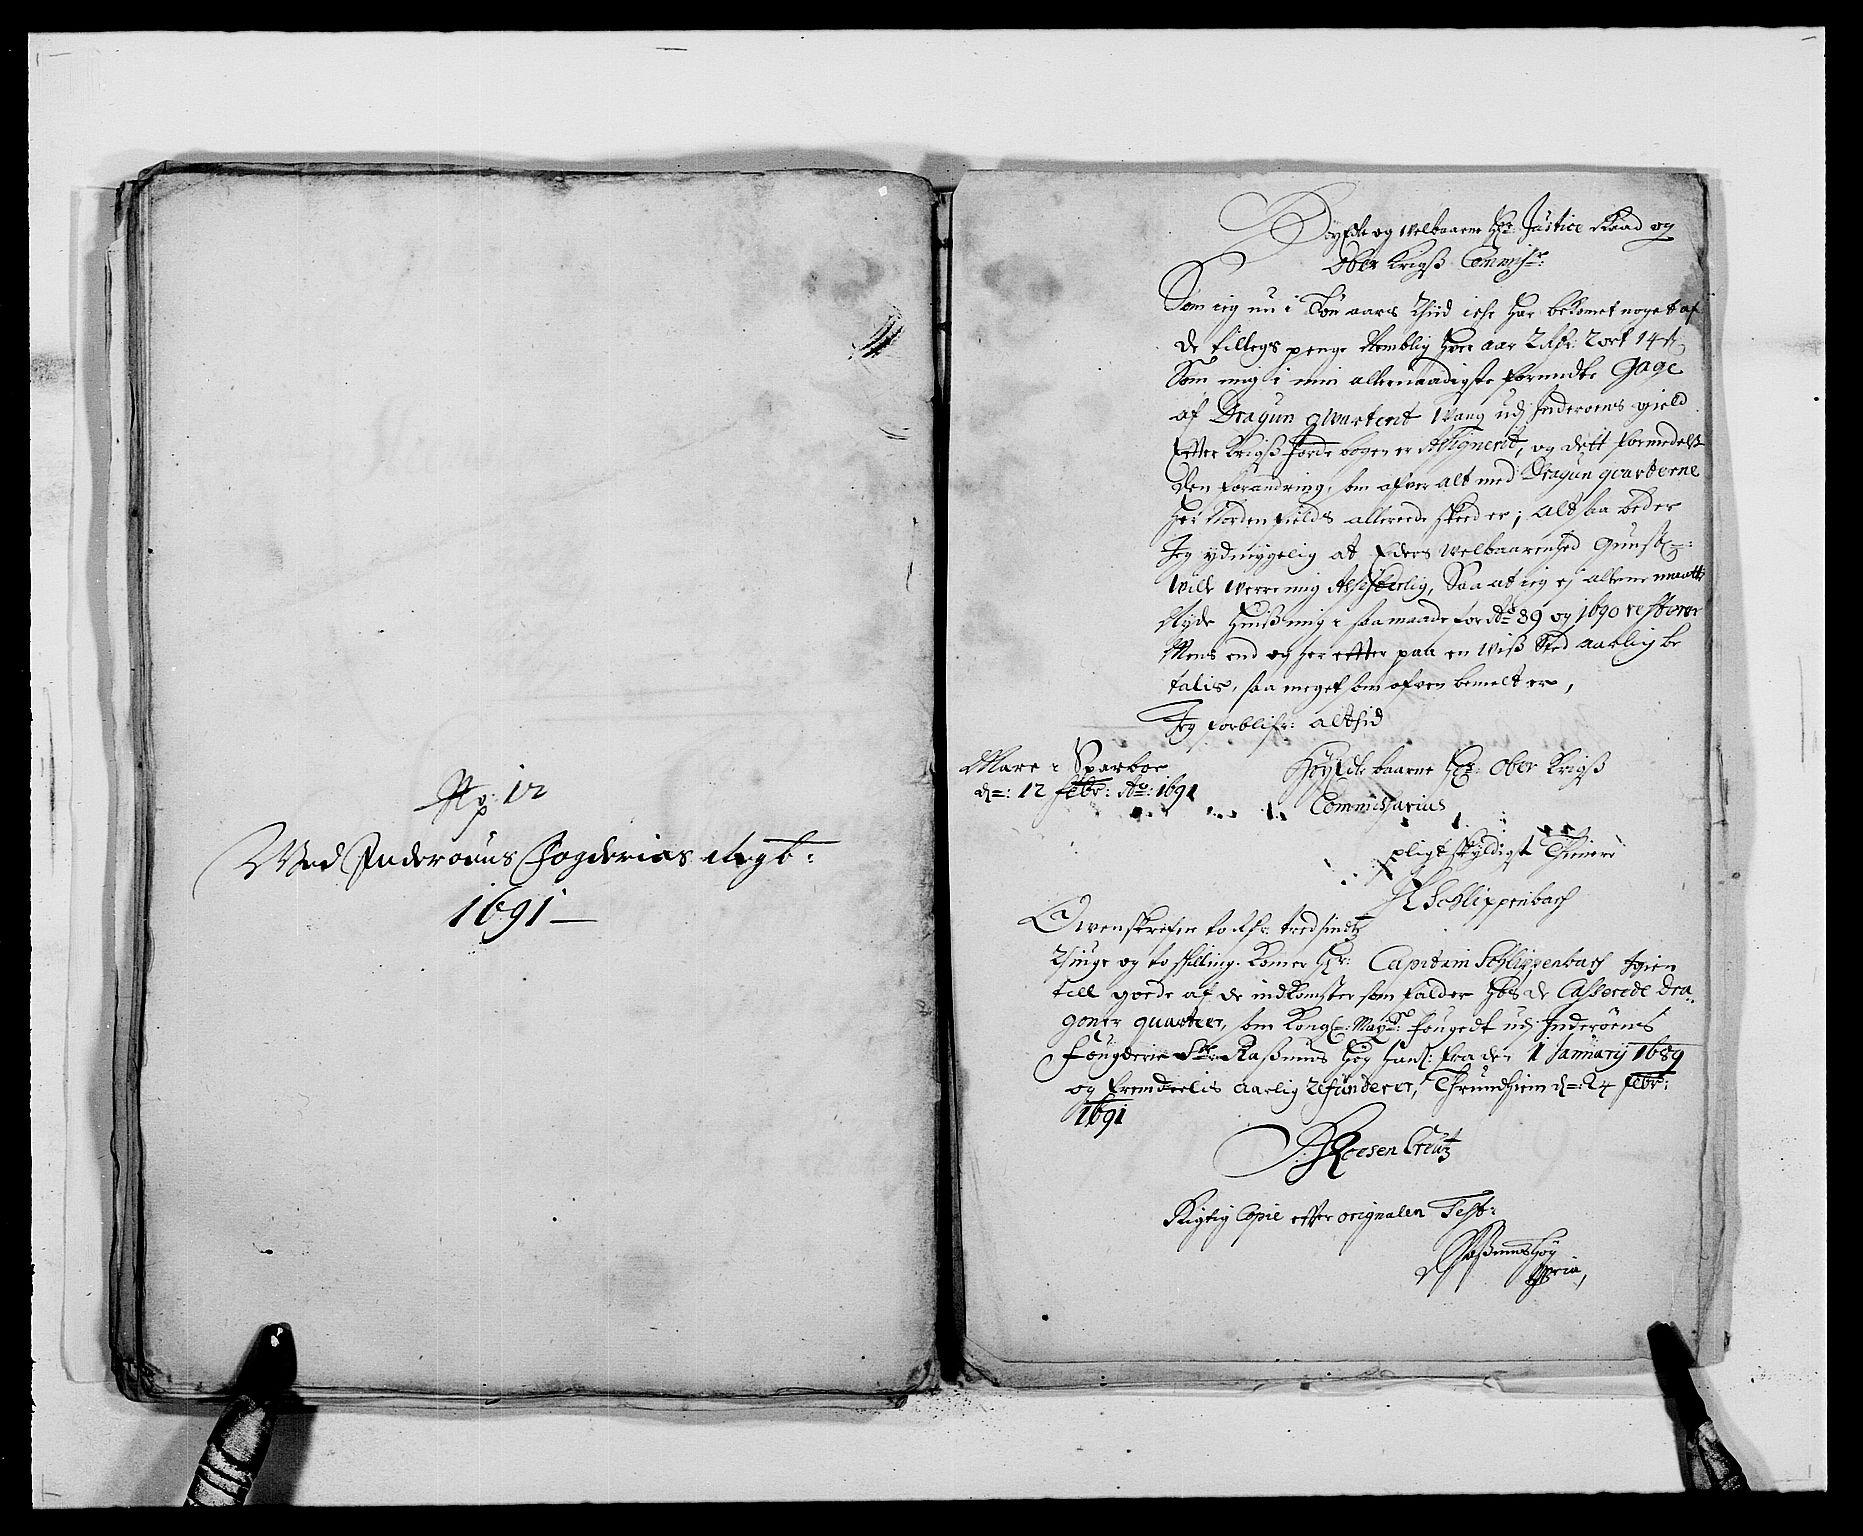 RA, Rentekammeret inntil 1814, Reviderte regnskaper, Fogderegnskap, R63/L4307: Fogderegnskap Inderøy, 1690-1691, s. 458